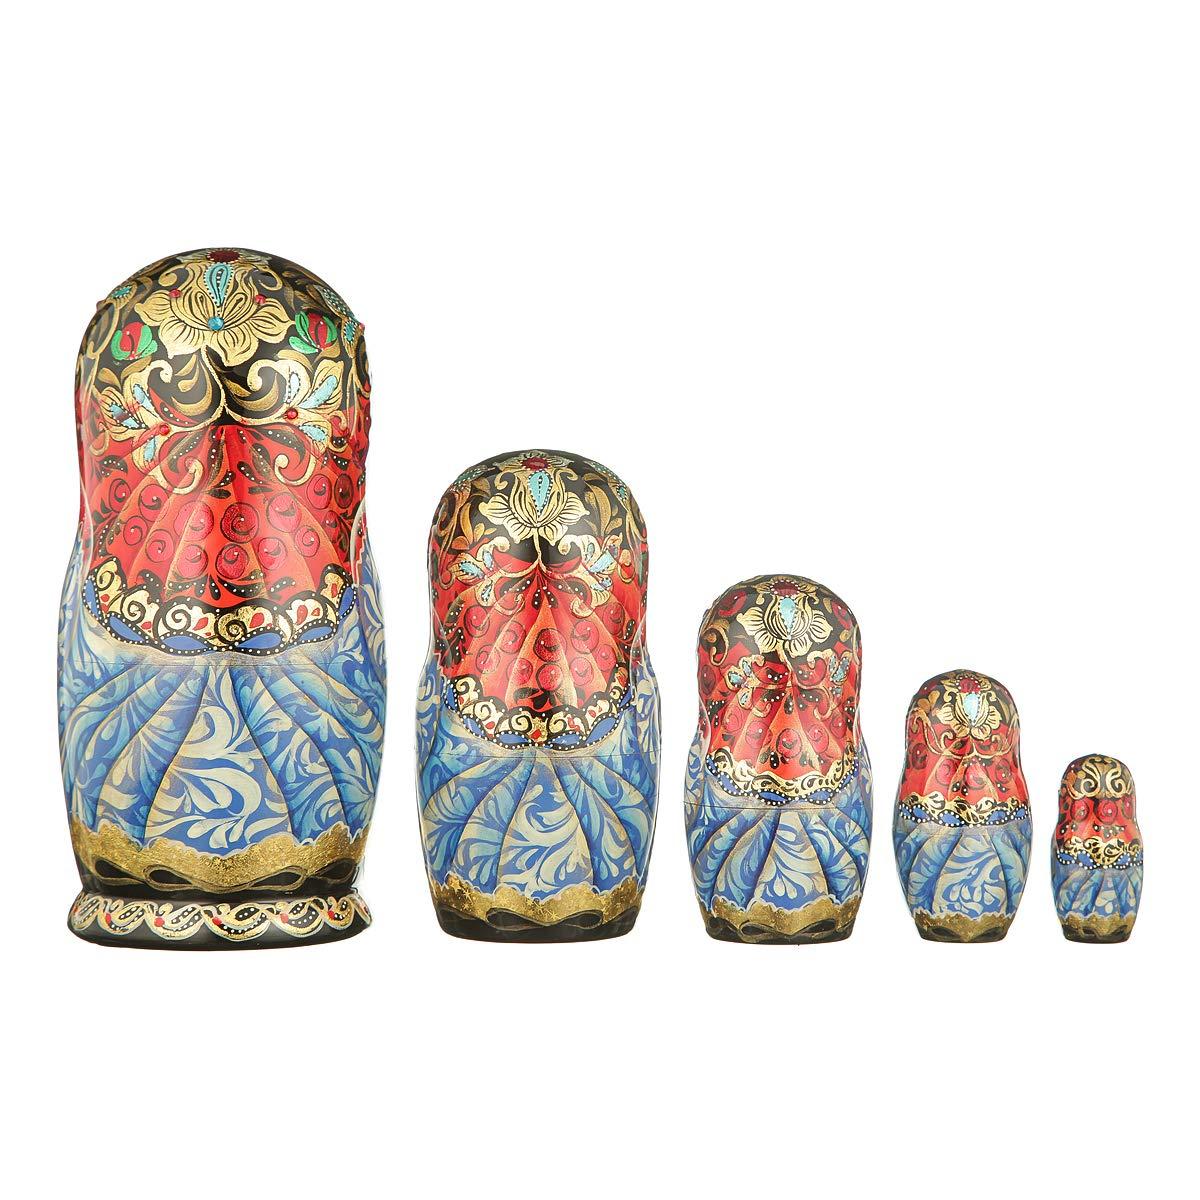 danila-souvenirs Russian Wooden Nesting Dolls Hand Painted Matryoshka 5 pcs Set Winter Troika 7.5'' by danila-souvenirs (Image #2)